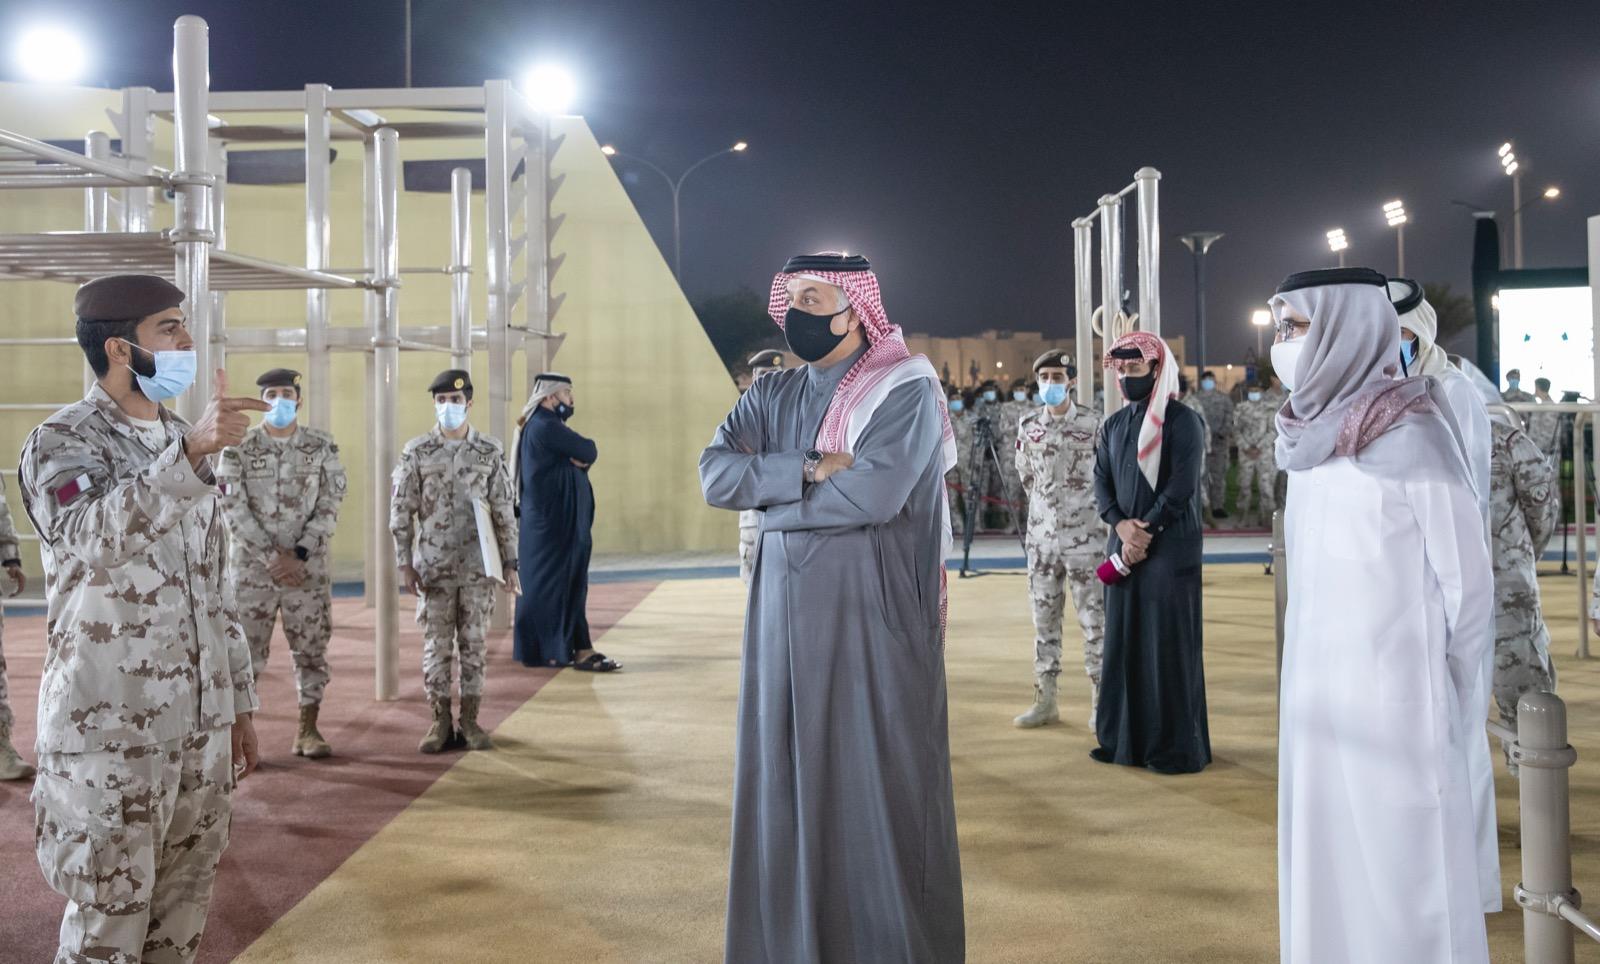 World's largest calisthenics park inaugurated in Qatar